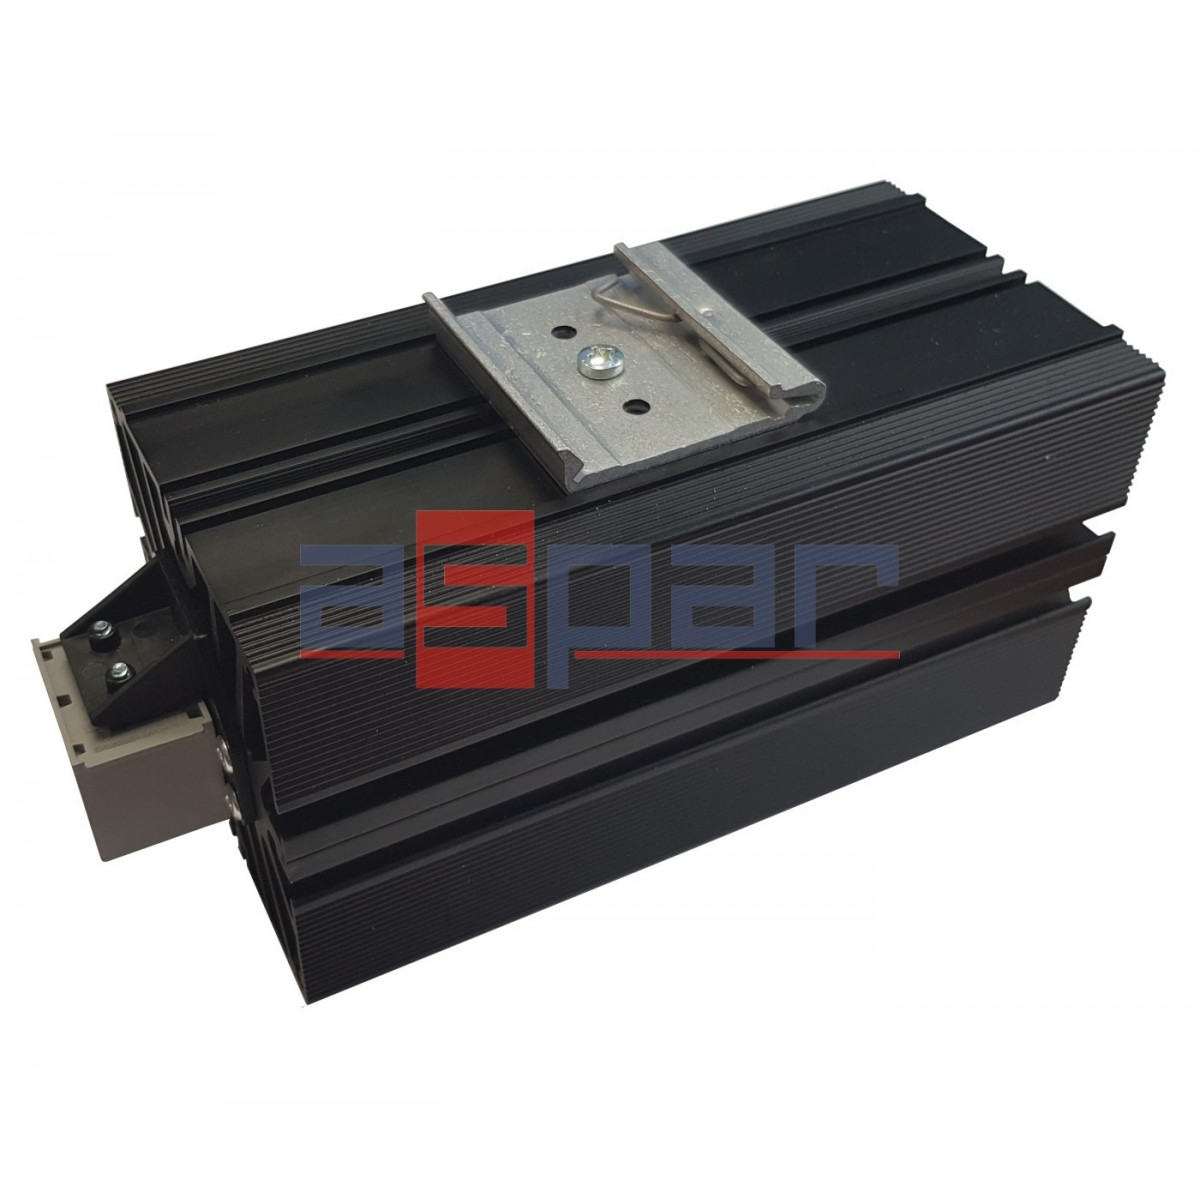 SH150 110-240V AC/DC - heater, 150W